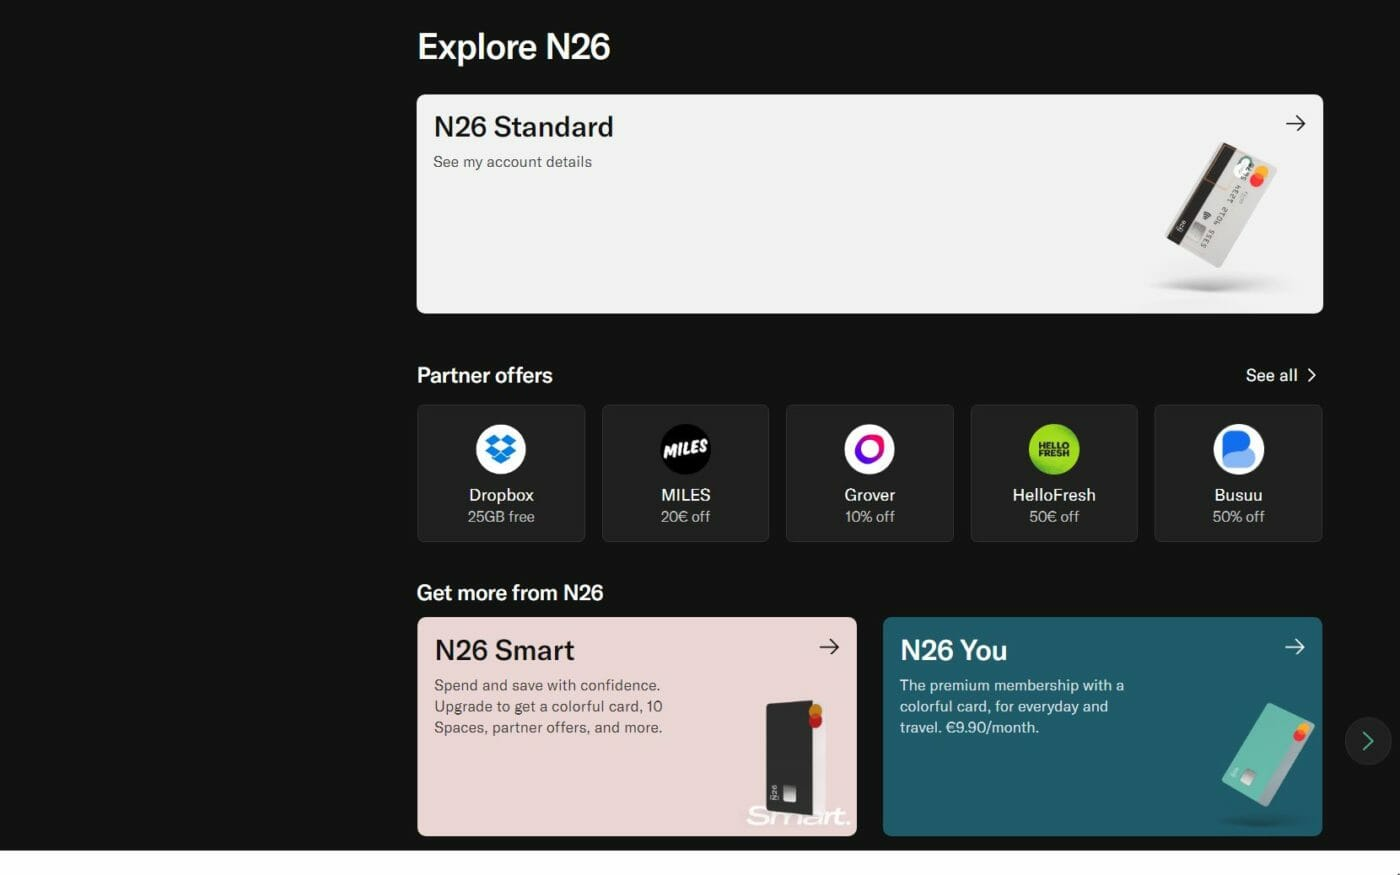 n26 Partner Offers